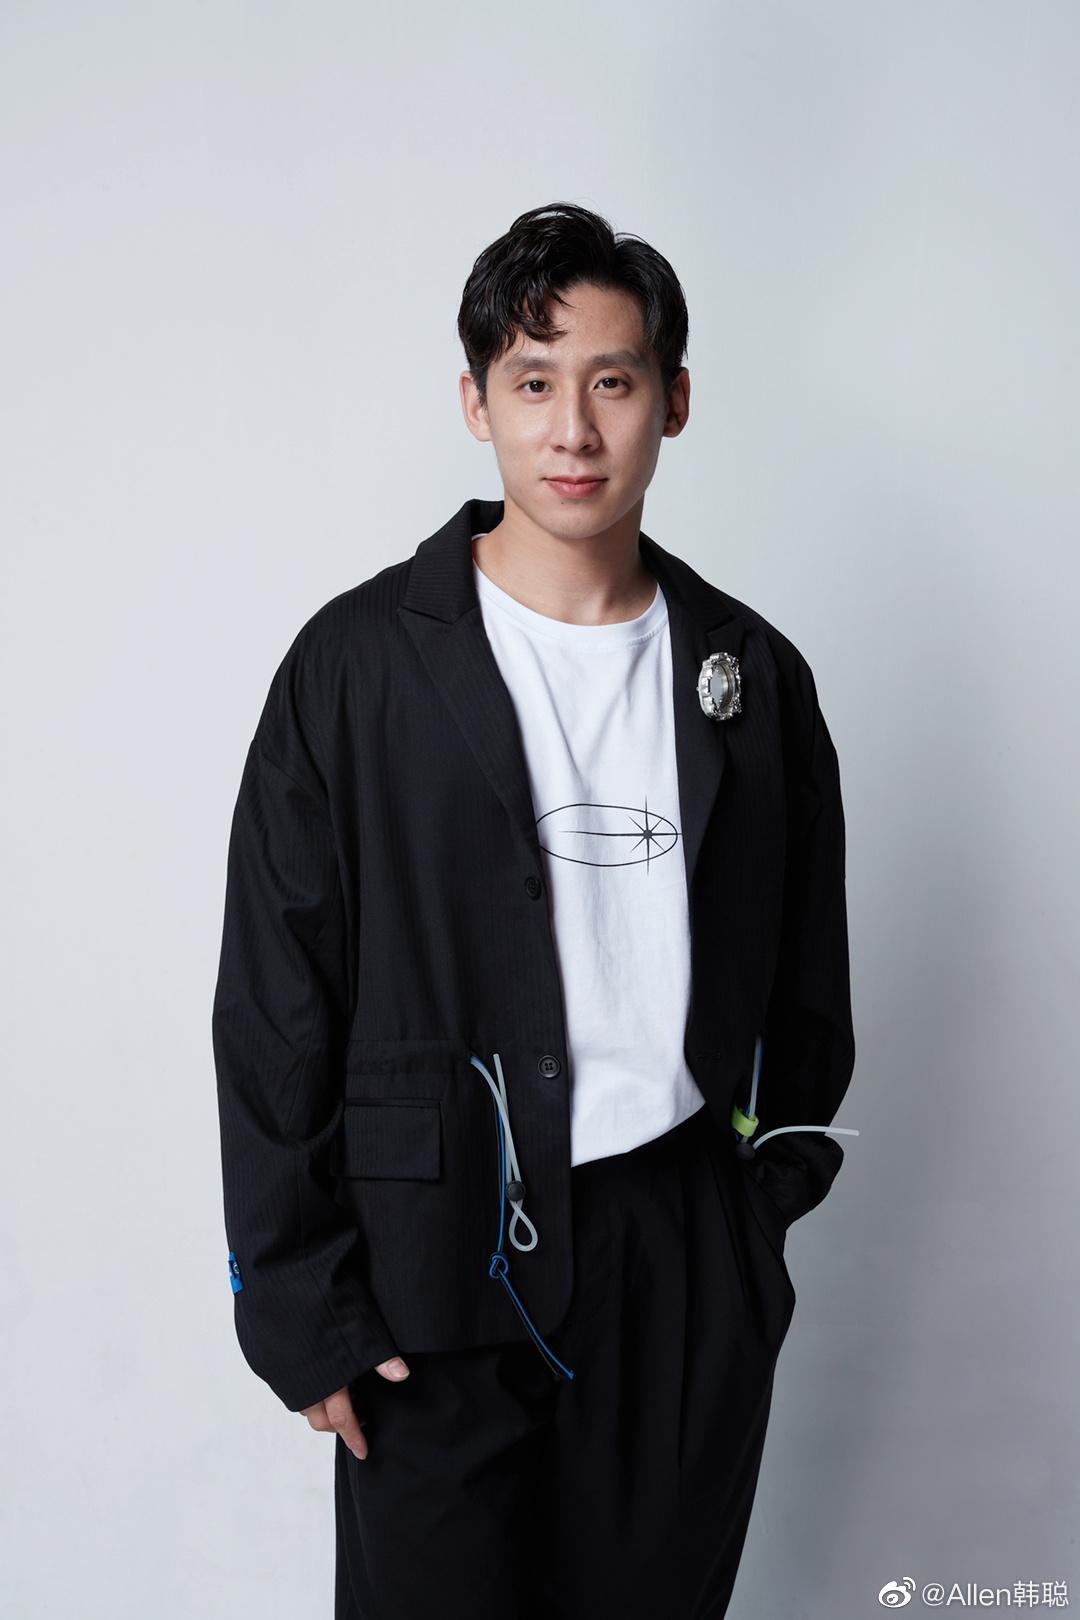 Вэньцзин Суй - Цун Хань / Wenjing SUI - Cong HAN CHN - Страница 18 4etaje65kh3lzz41lyu5p6cwx